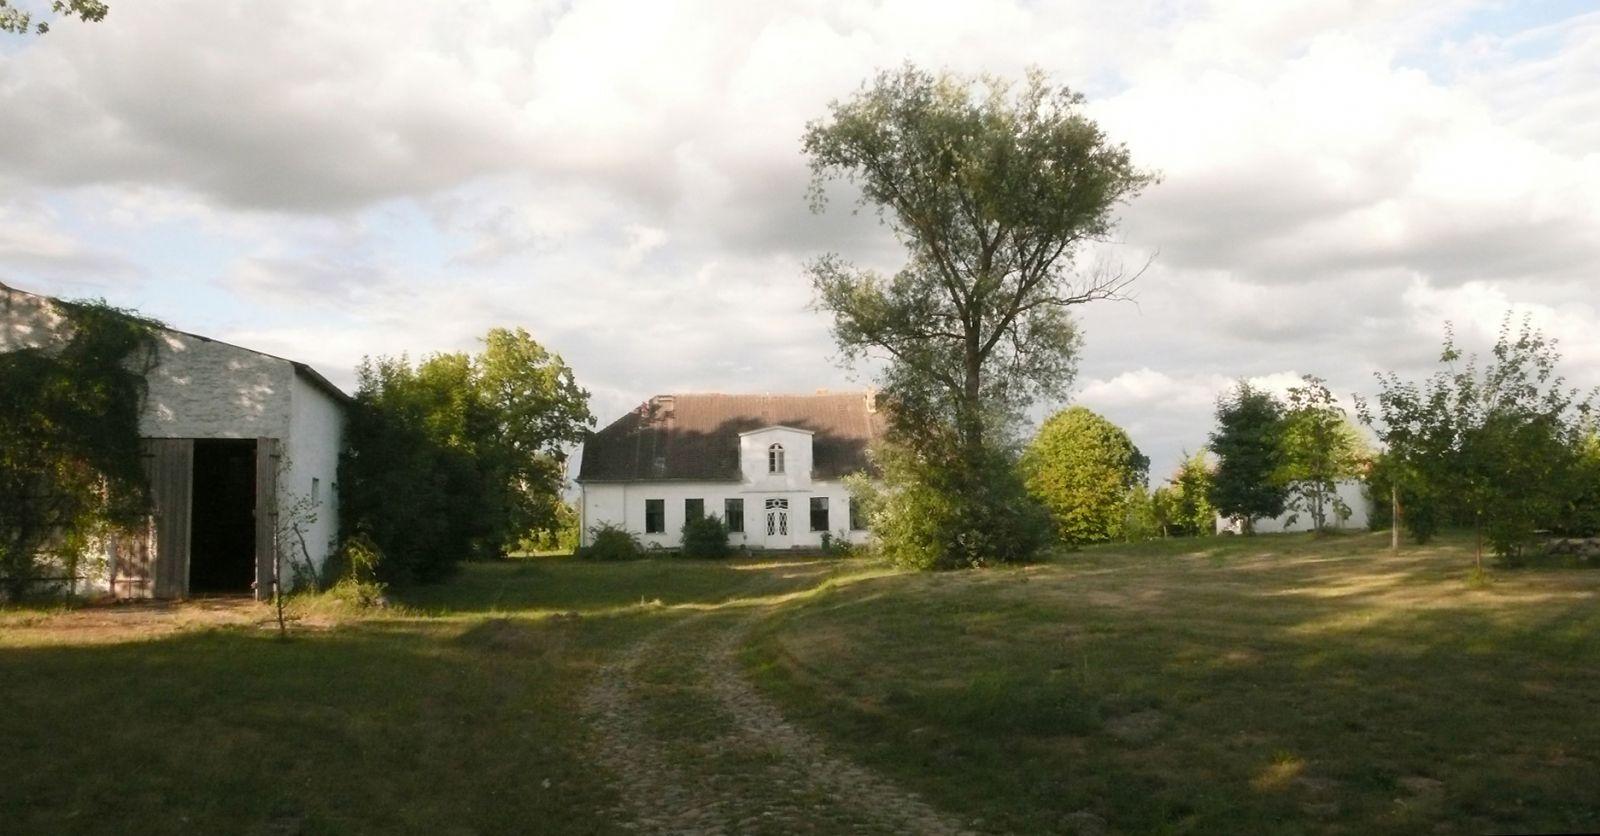 Colour photo of the Nossendorf estate